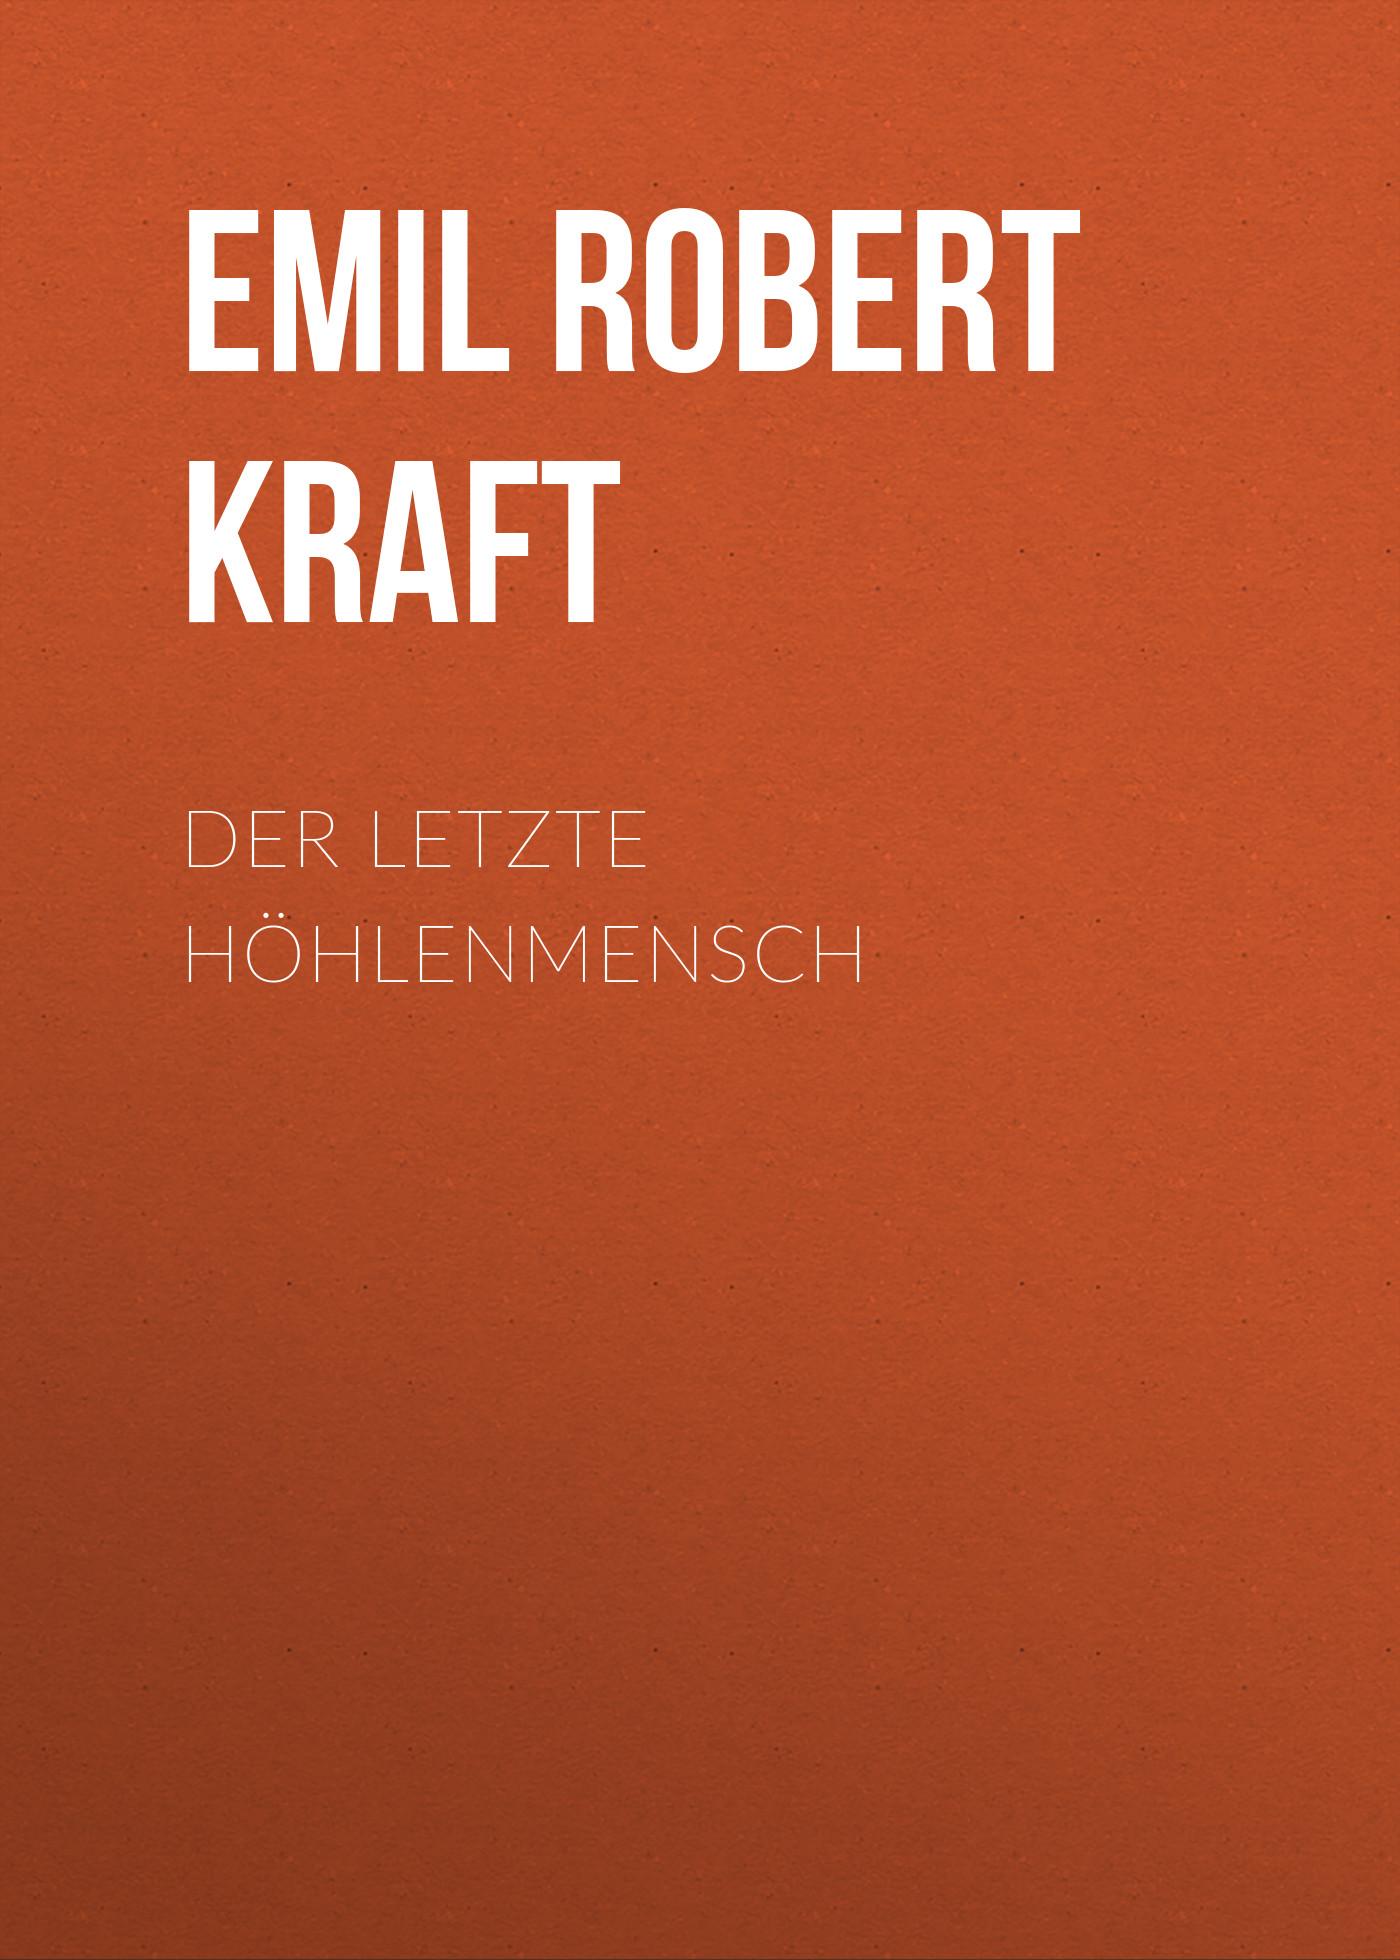 Emil Robert Kraft Der letzte Höhlenmensch robert emden gaskugeln anwendungen der mechanischen warmetheorie